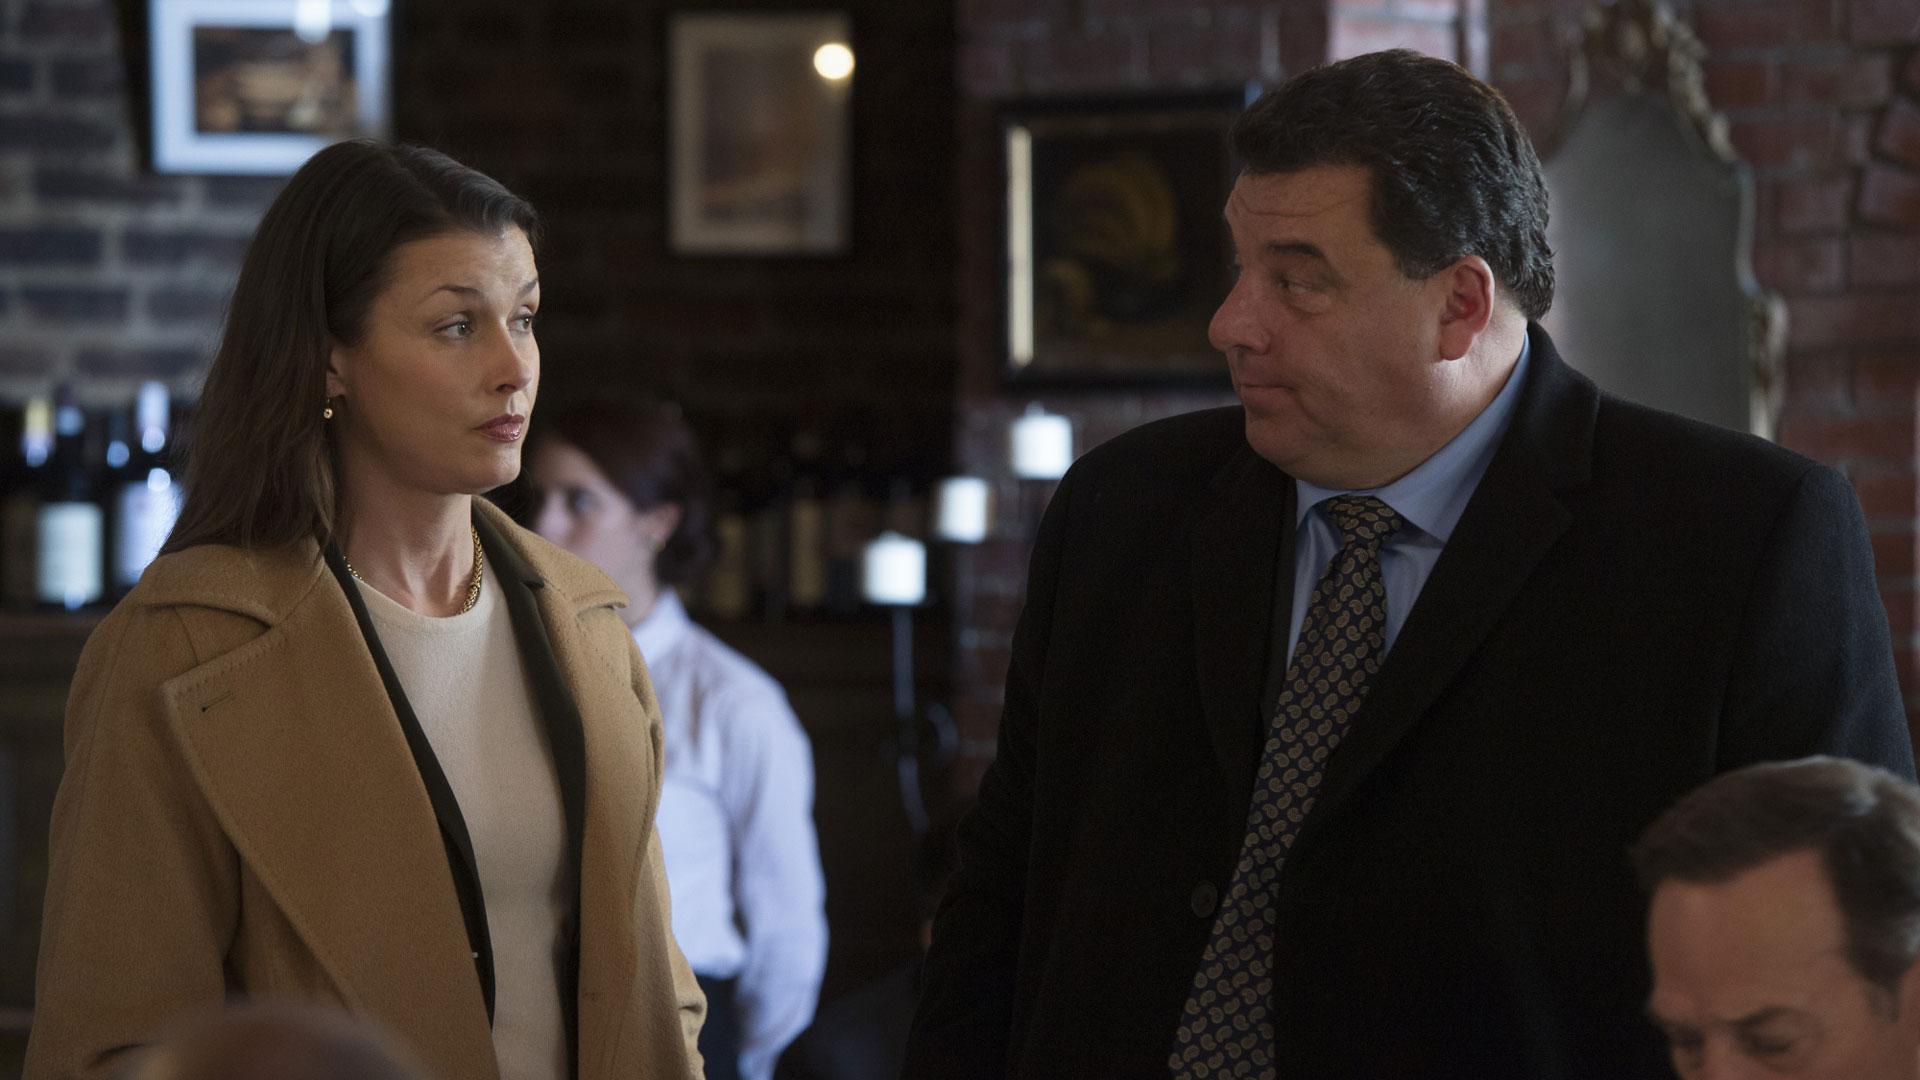 Bridget Moynahan as Erin Reagan and Steve Schirripa as Anthony Abetemarco